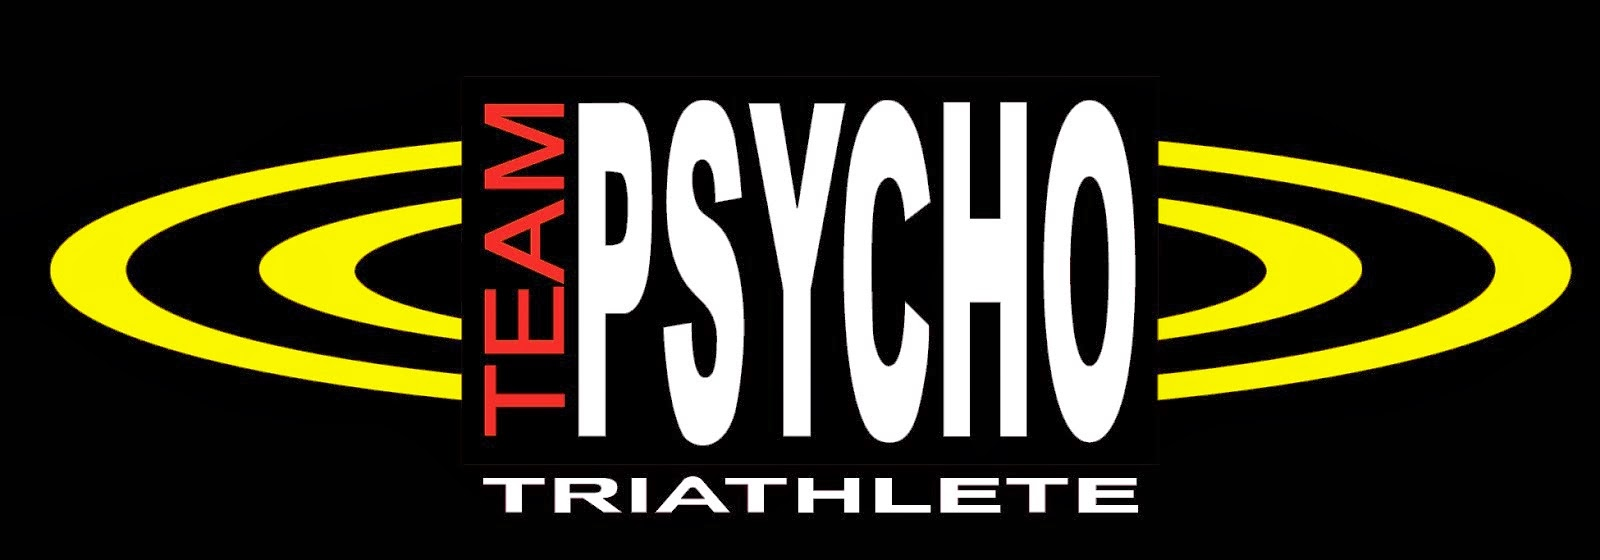 Team Psycho